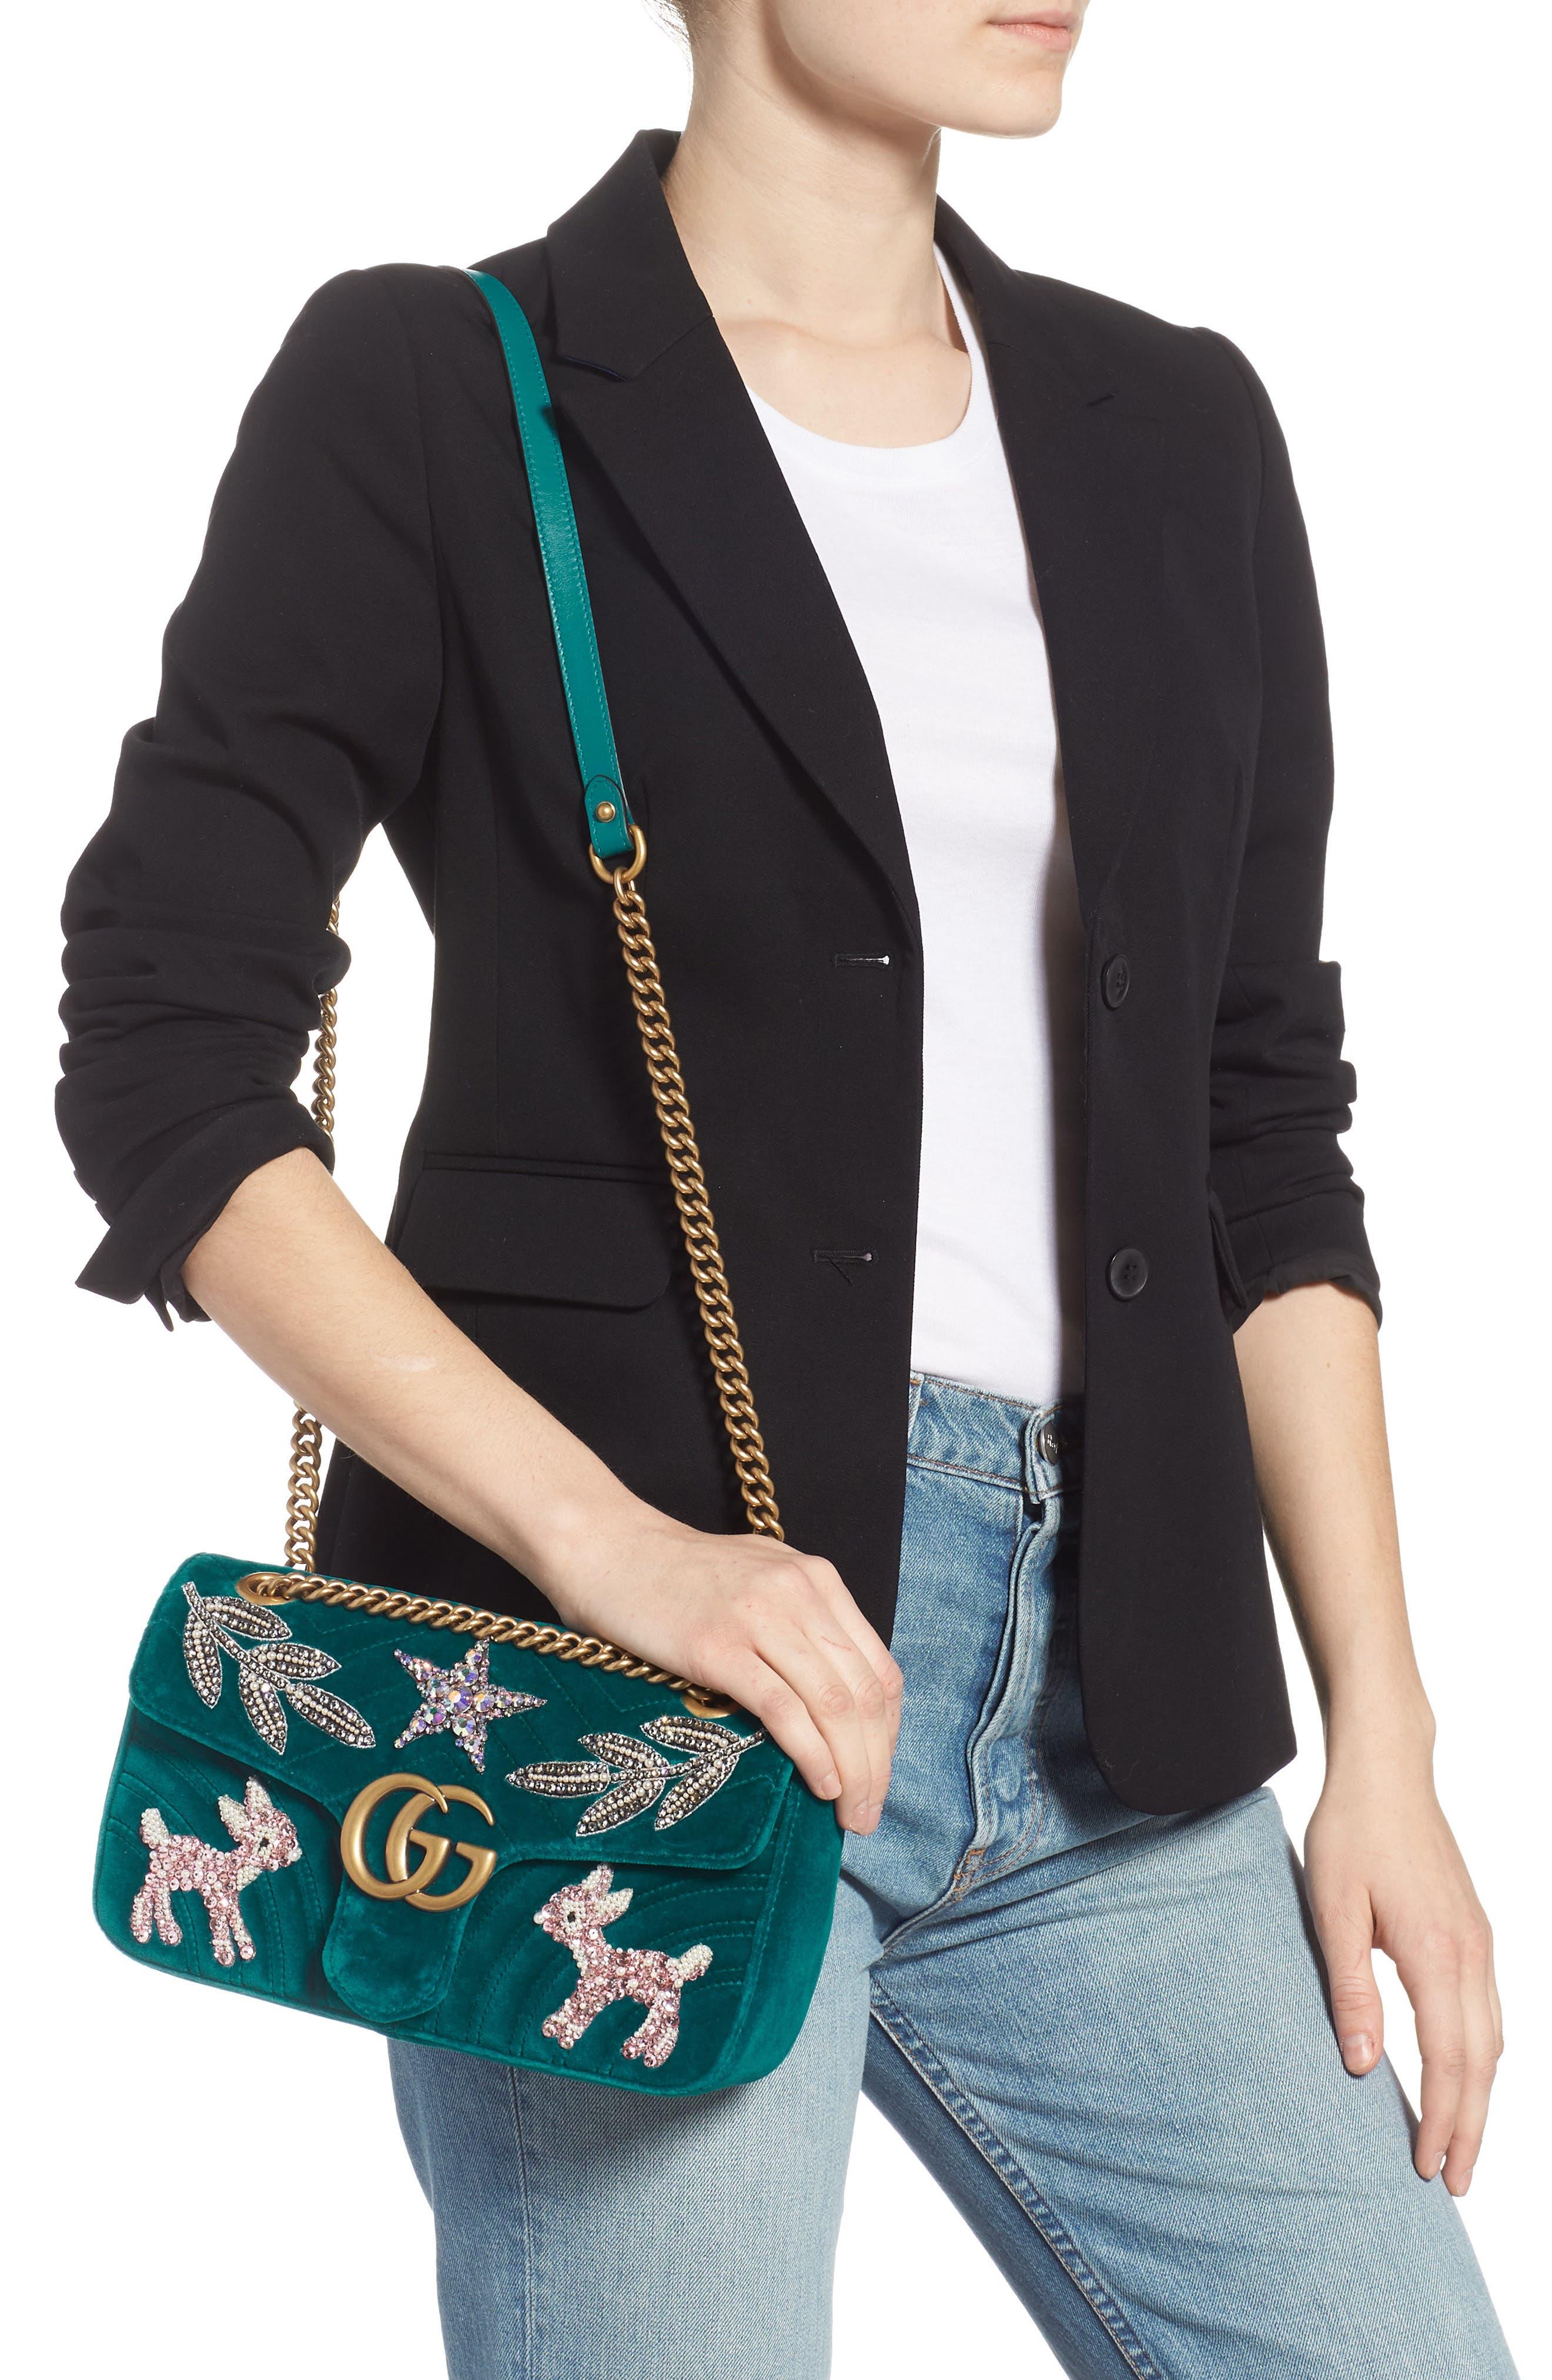 GG Marmont 2.0 Matelassé Velvet Shoulder Bag,                             Alternate thumbnail 2, color,                             440